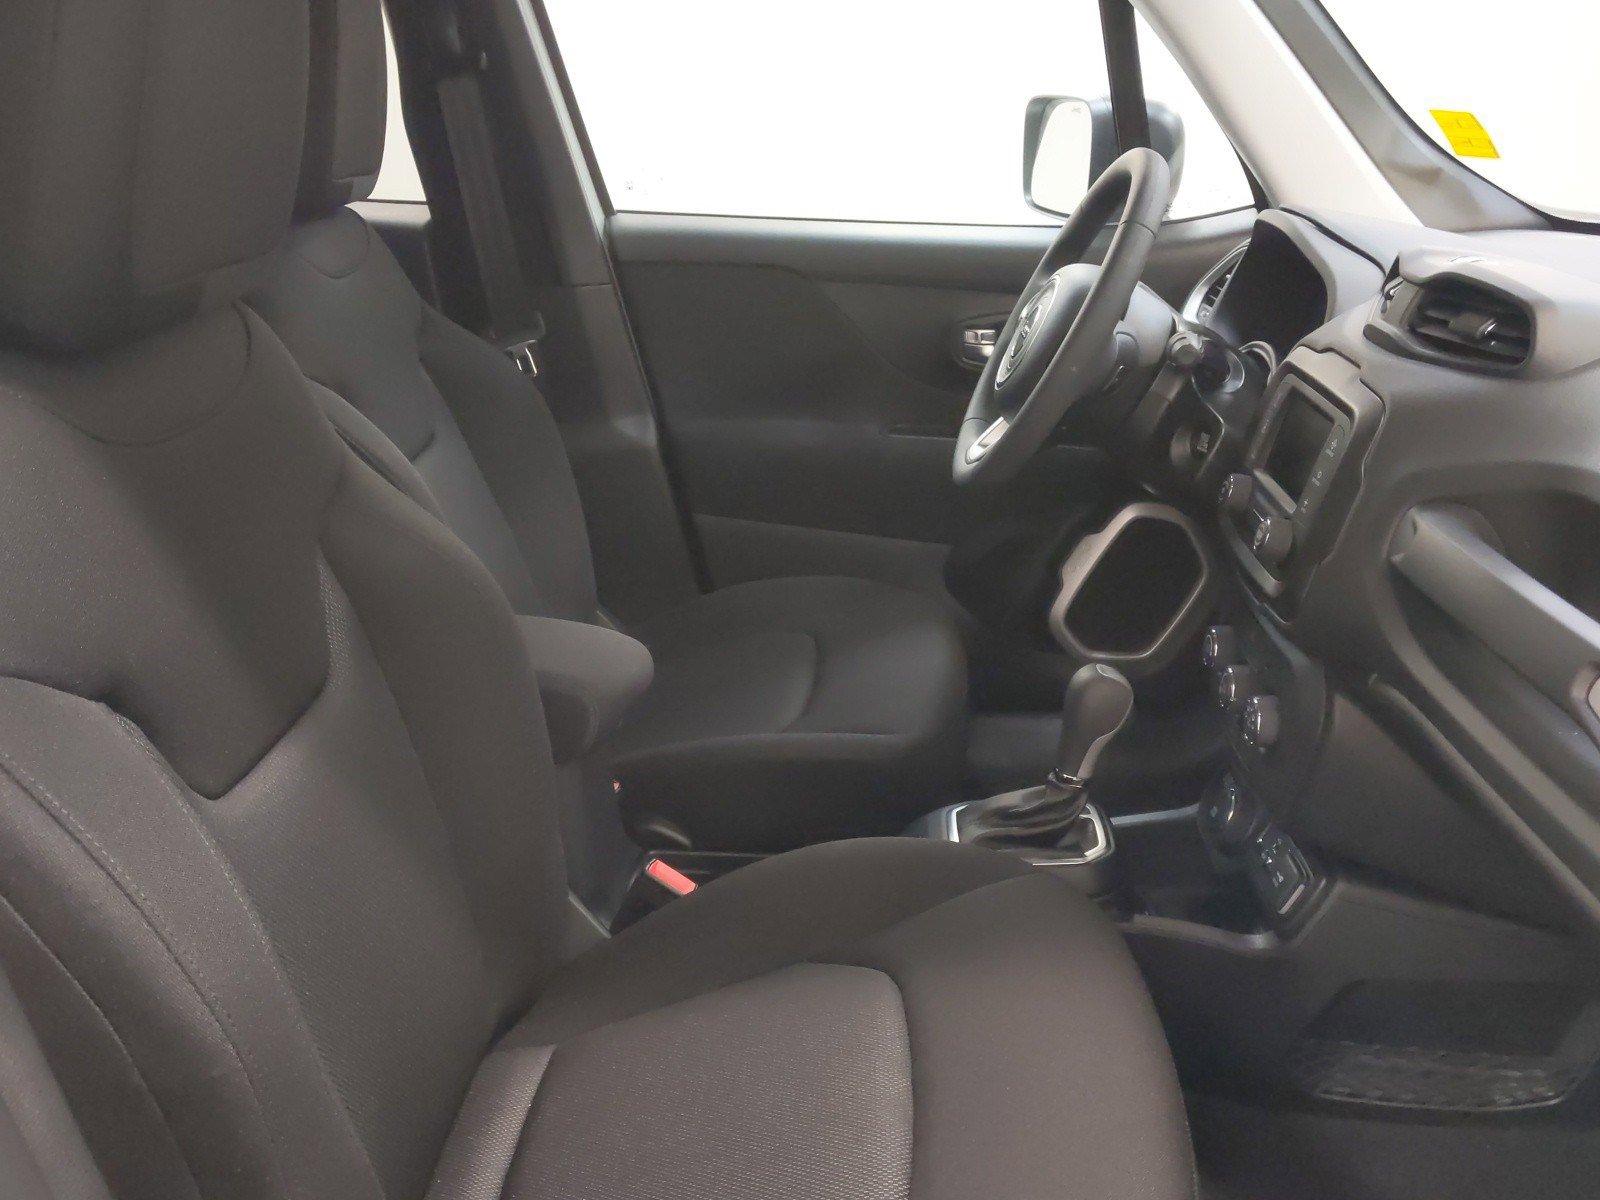 New 2020 Jeep Renegade Sport Sport Utility for sale in Grand Island NE